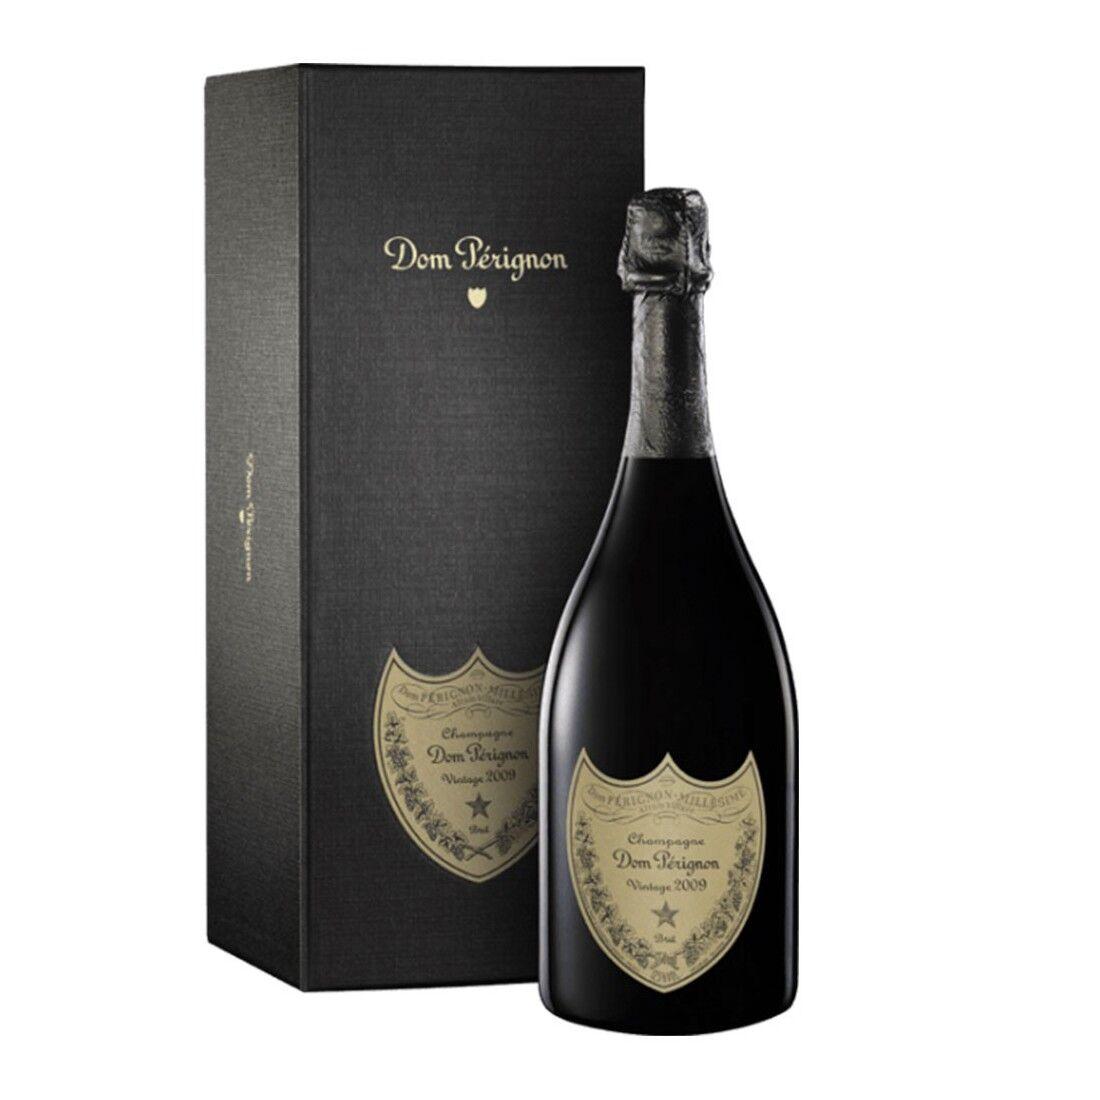 Dom Pérignon Champagne Vintage 2010 - [Astucciato]